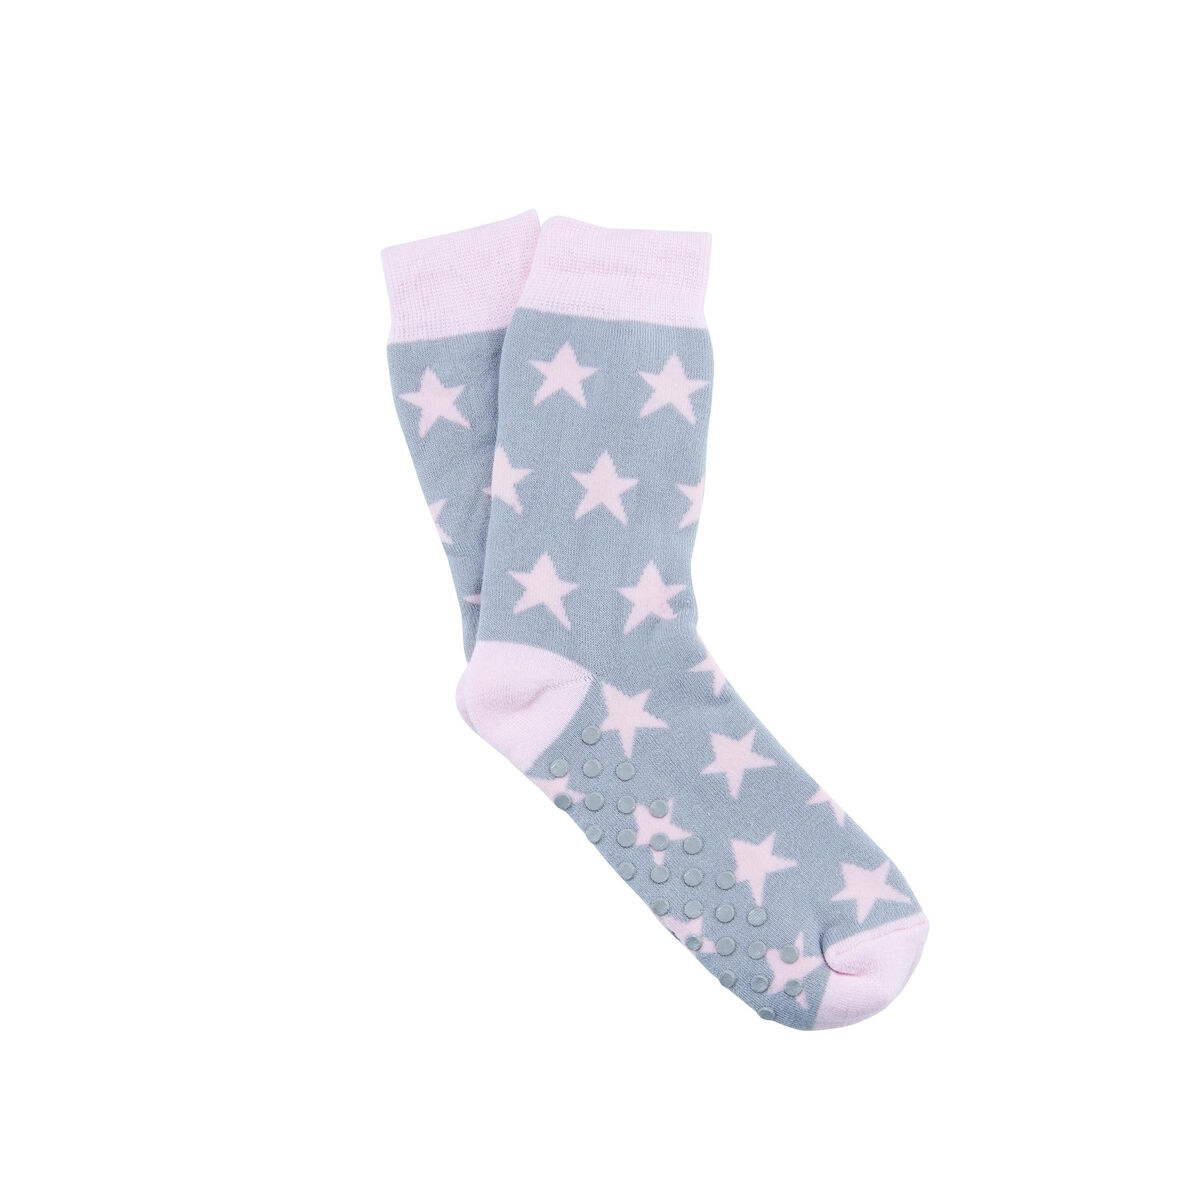 COZY SOCKS Socke Stern grau 35-38